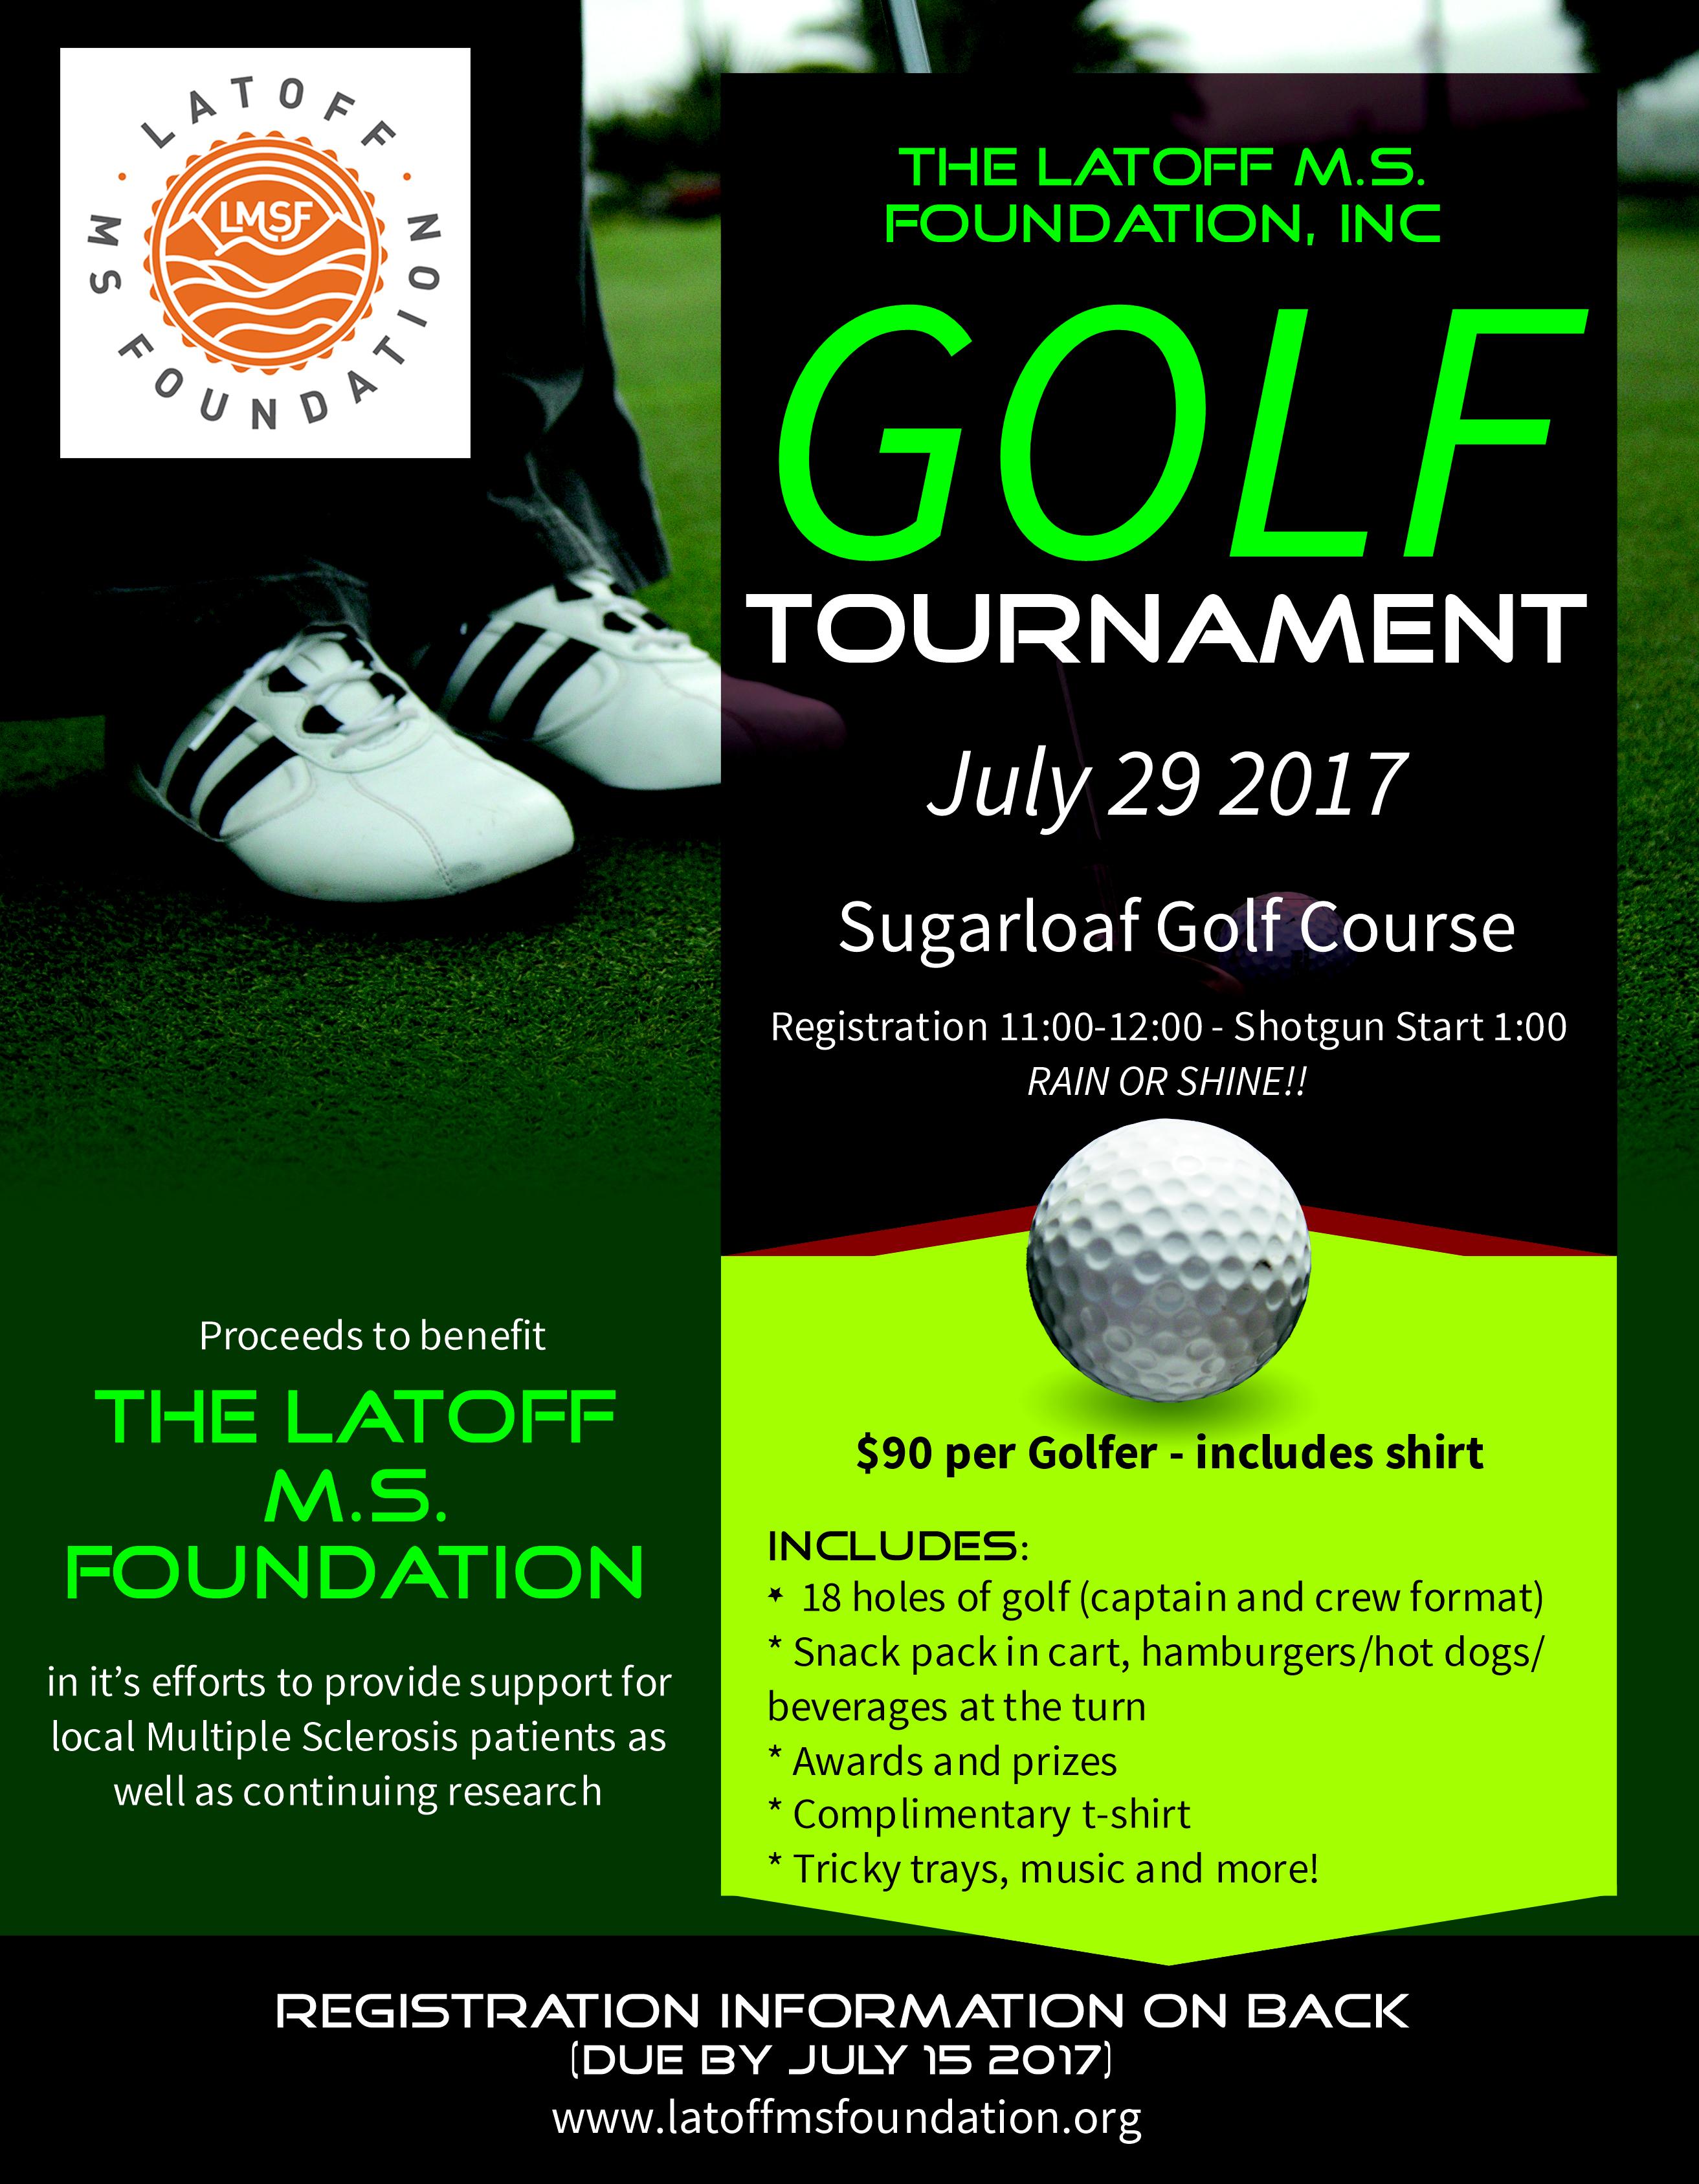 2017 Latoff MS Foundation Golf Tournament Flyer